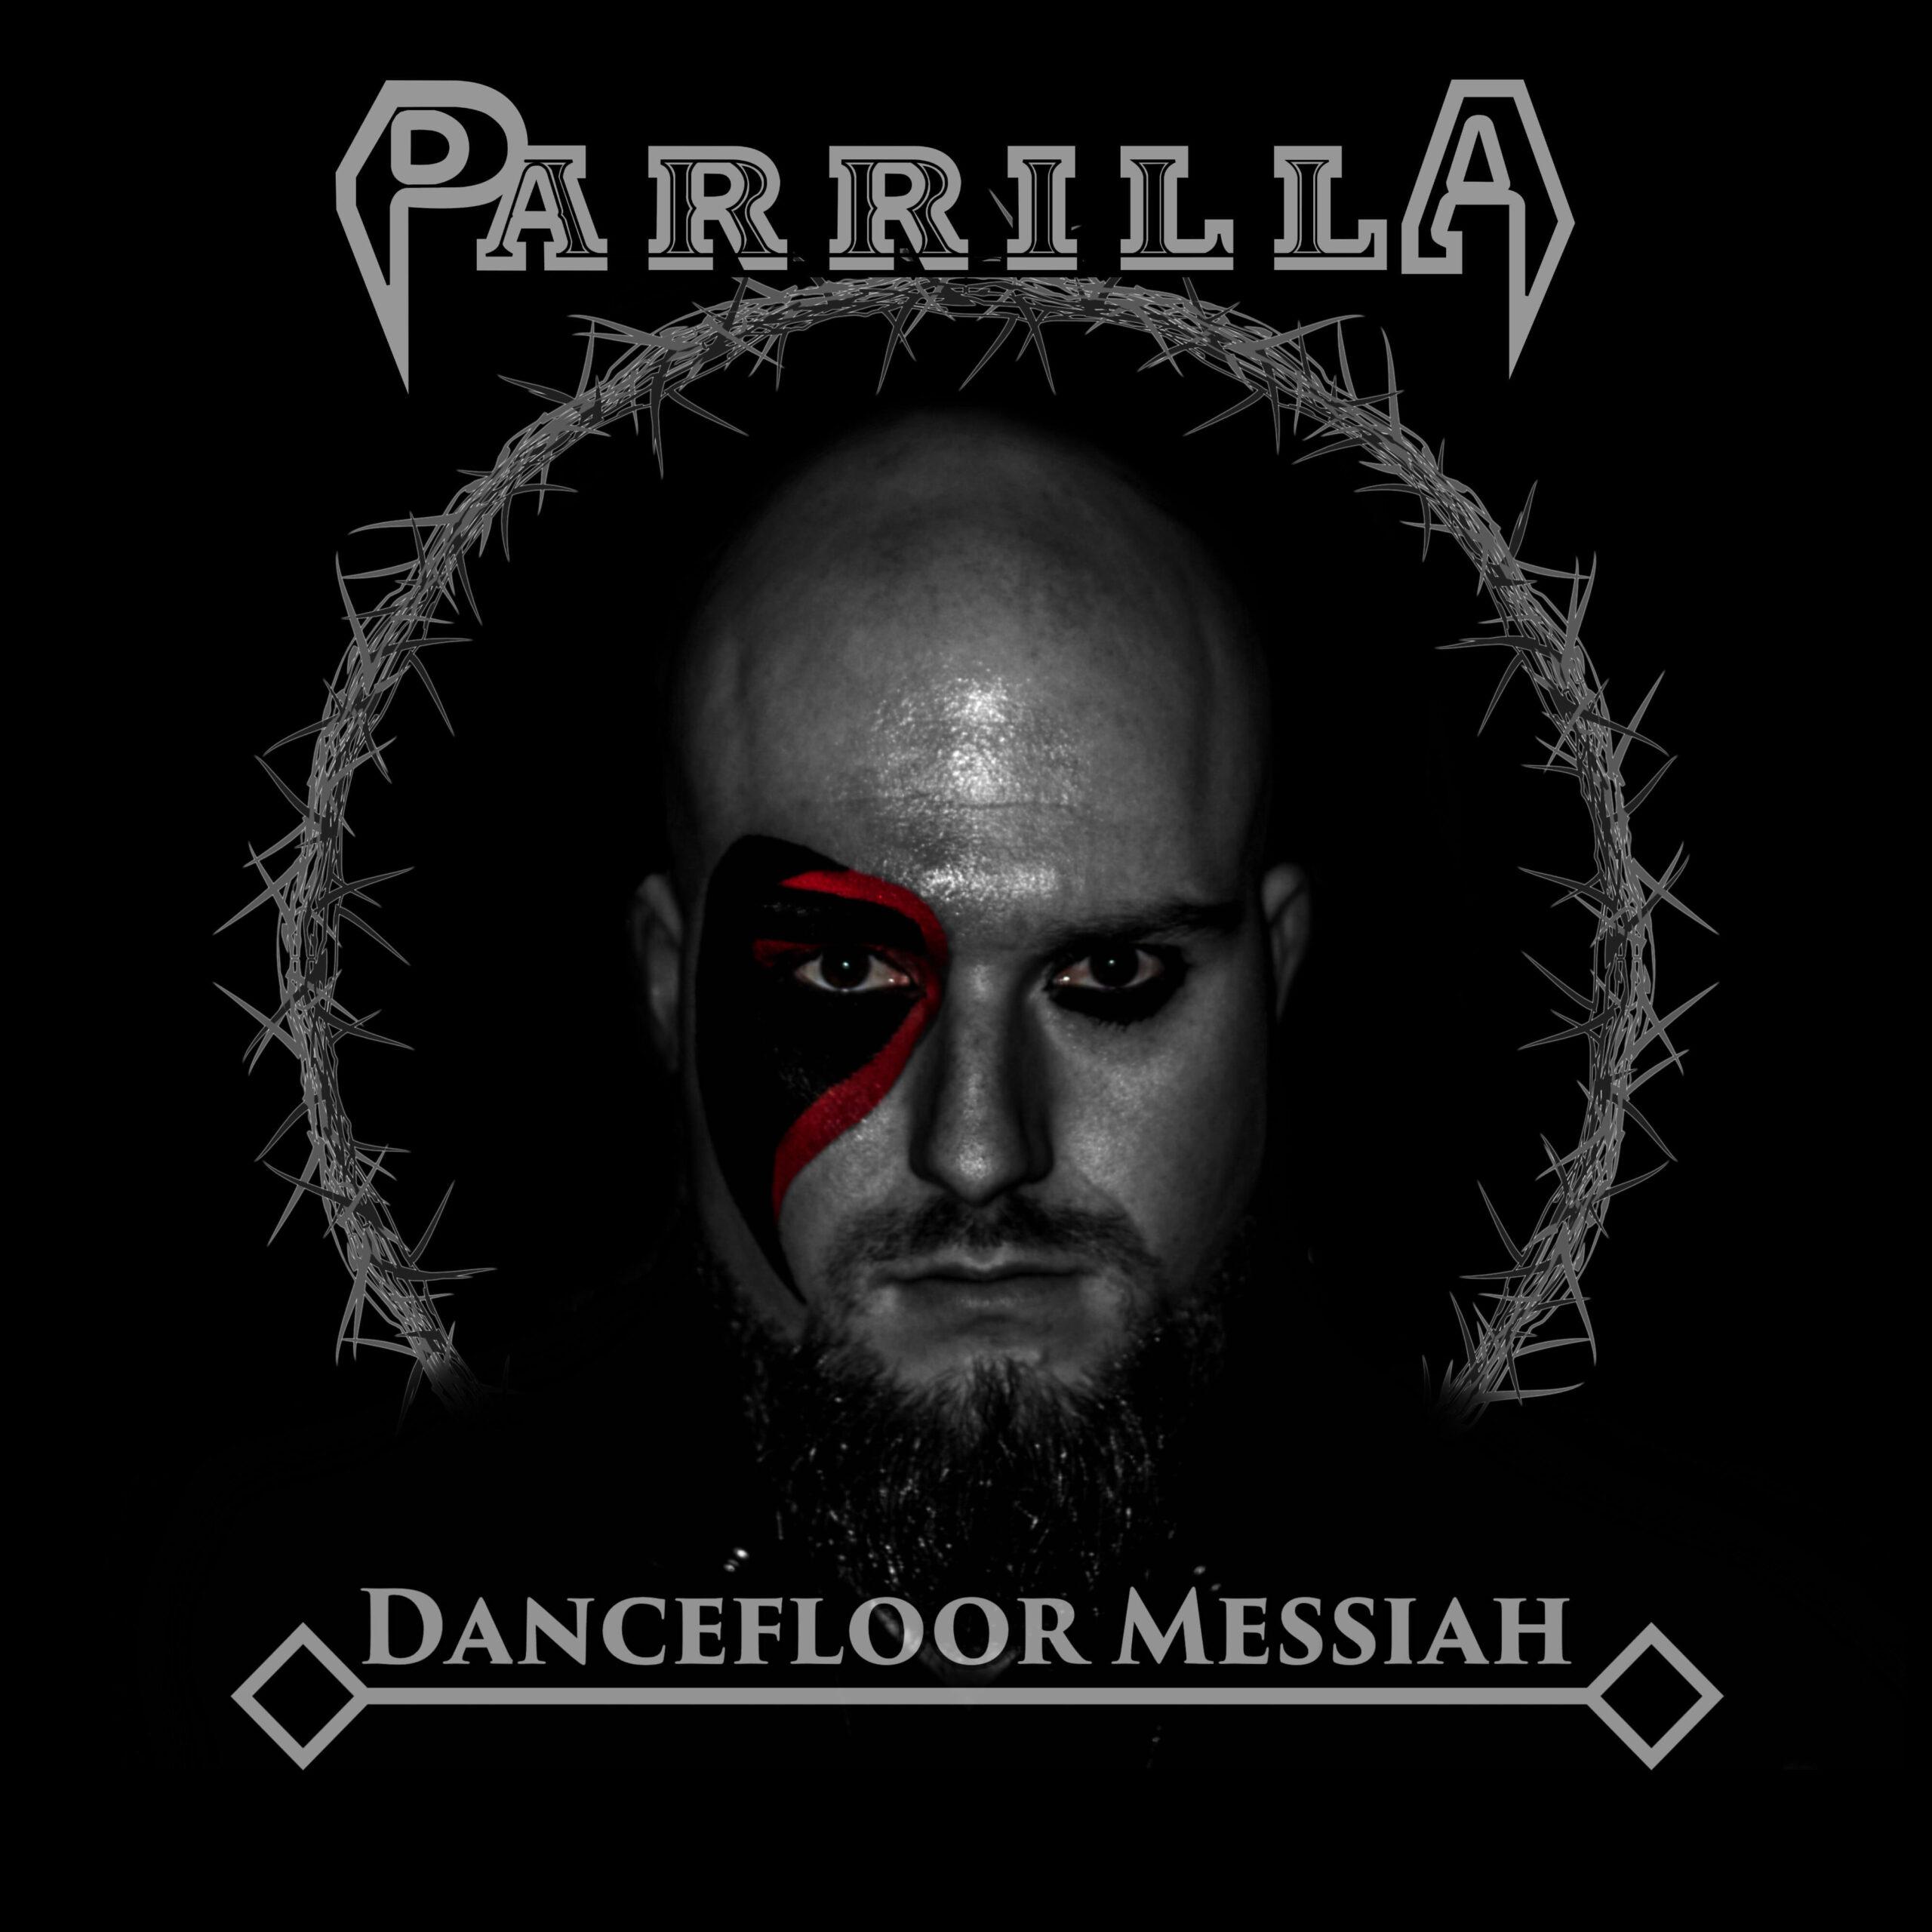 Front Cover of the Dancefloor Messiah EP